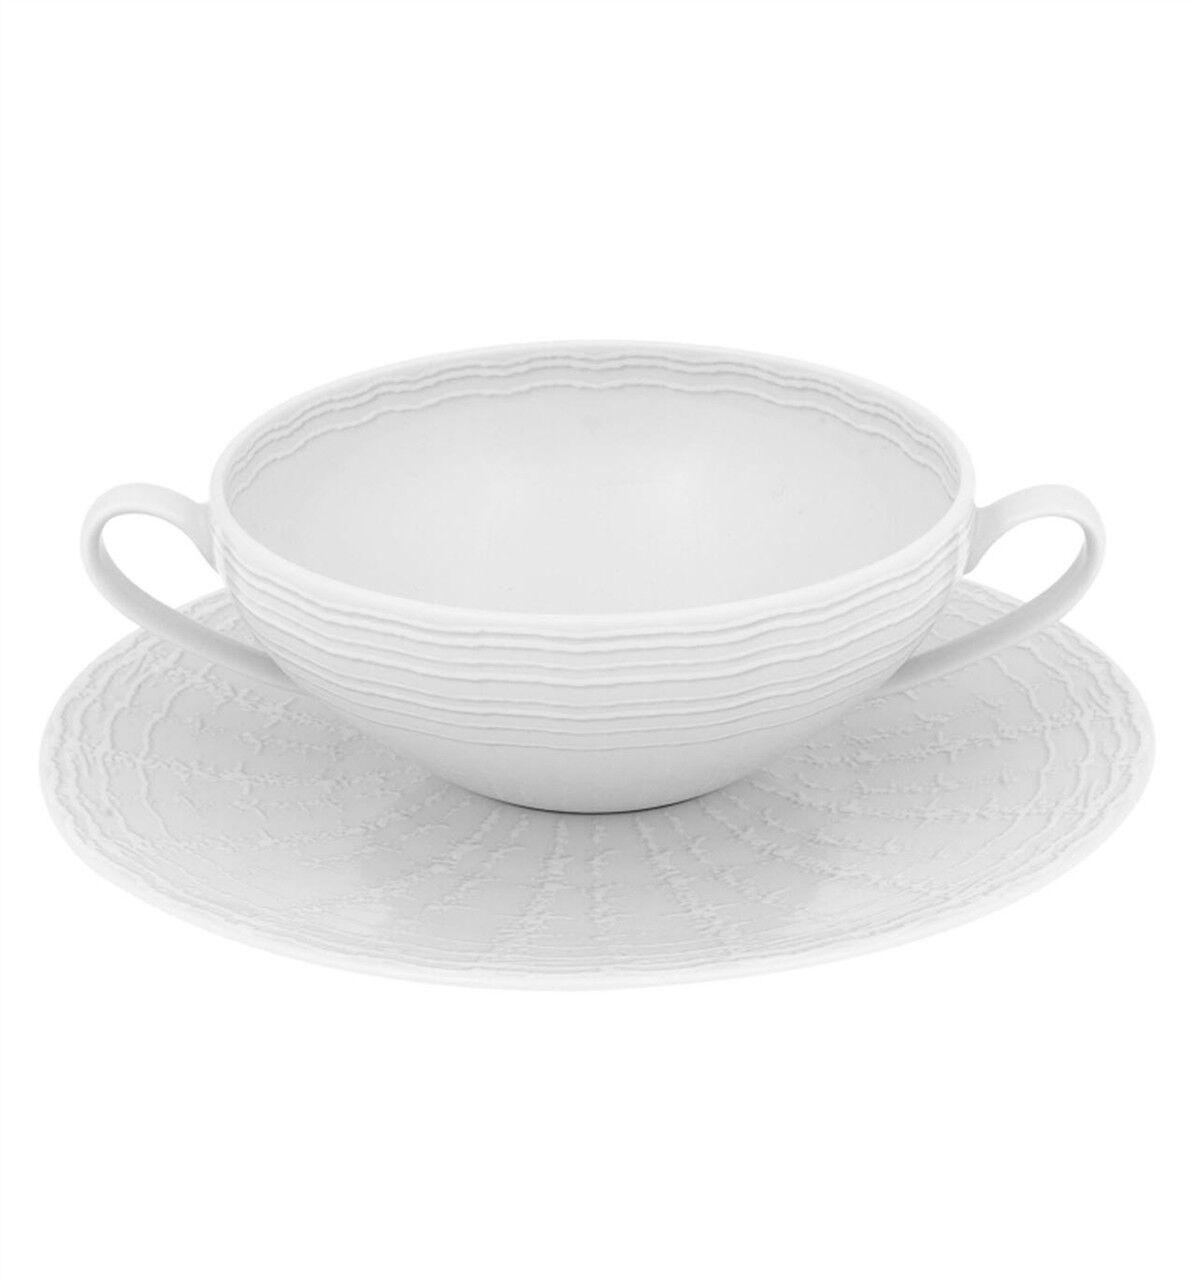 Vista Alegre Mar Consomme Cup & Saucer - Set of 8